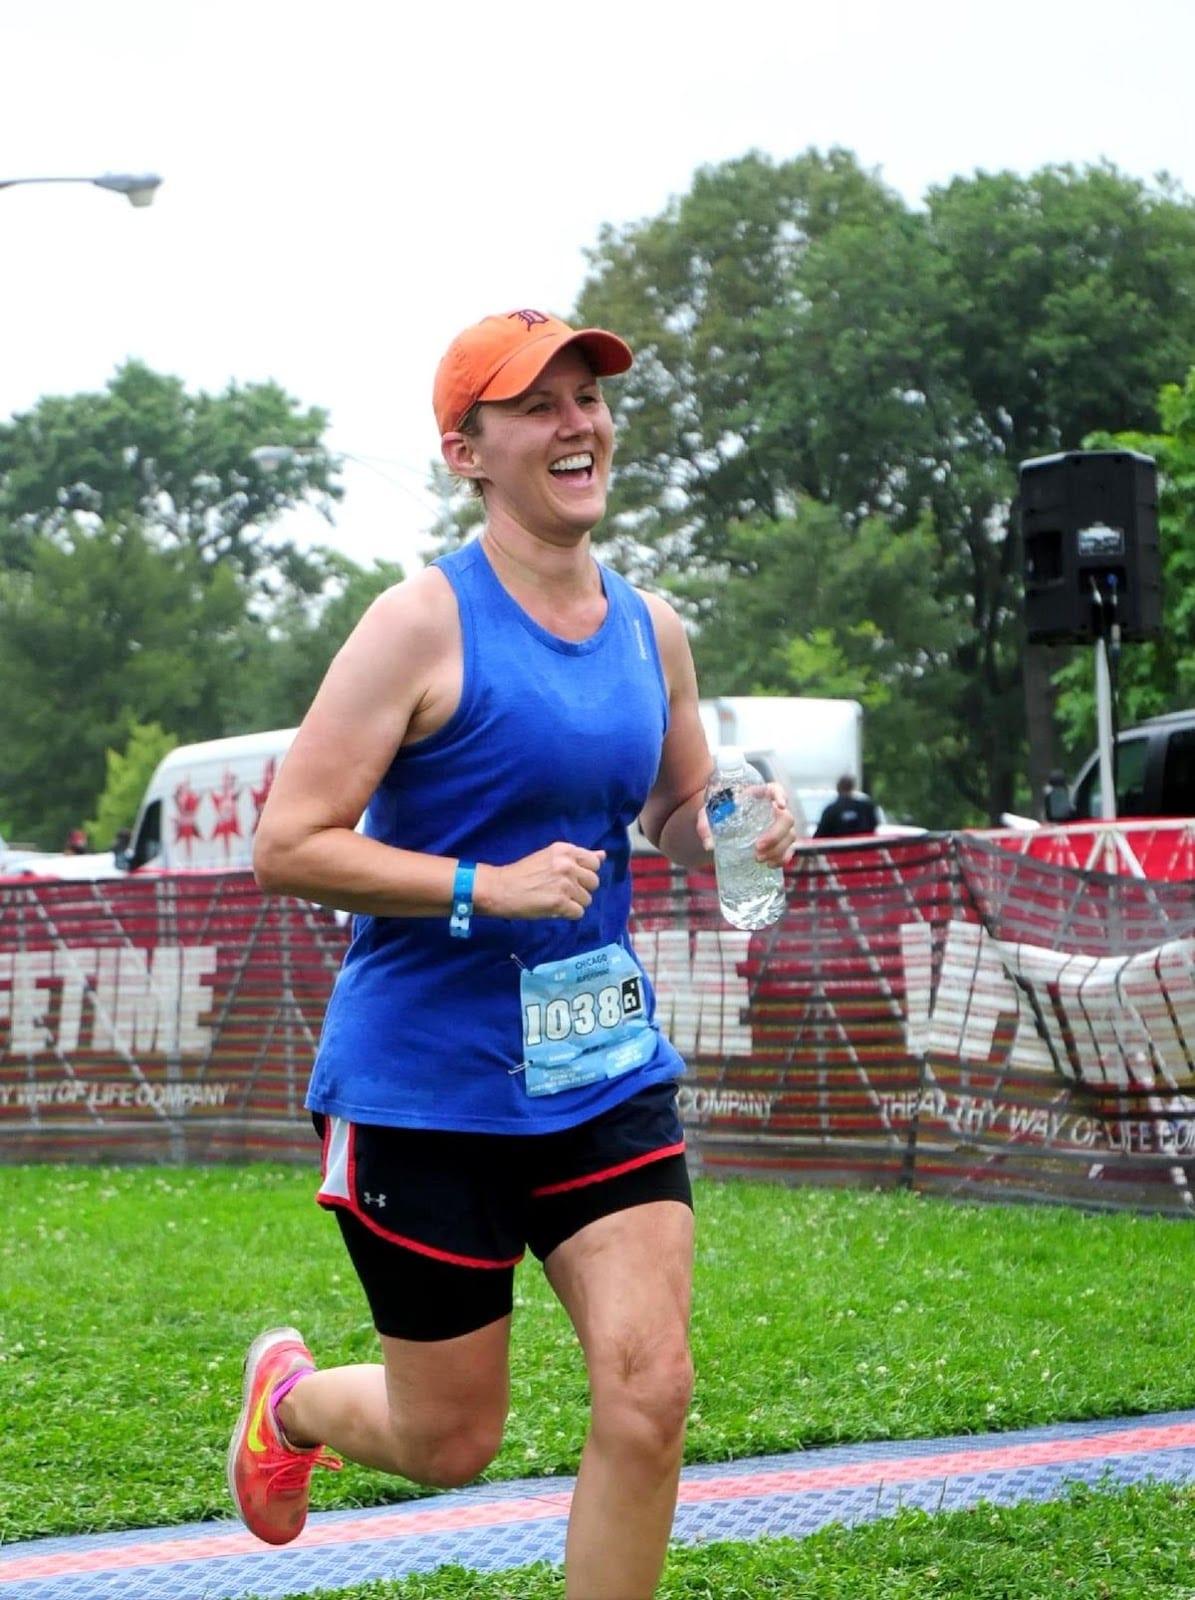 Lori Wilson triathlon